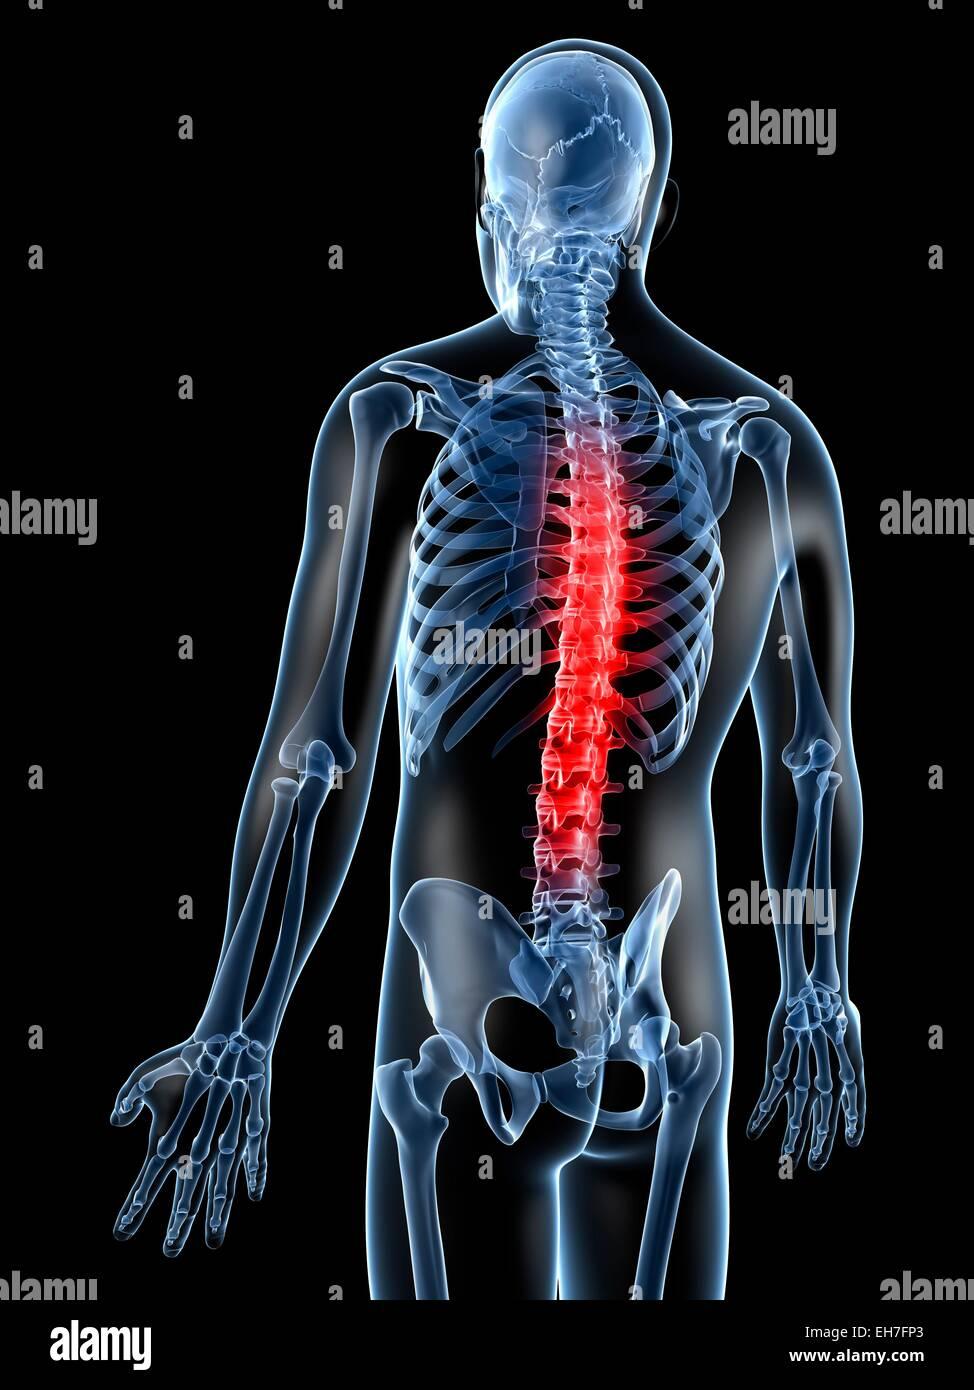 Human Thoracic Spine Pain Stock Photos & Human Thoracic Spine Pain ...